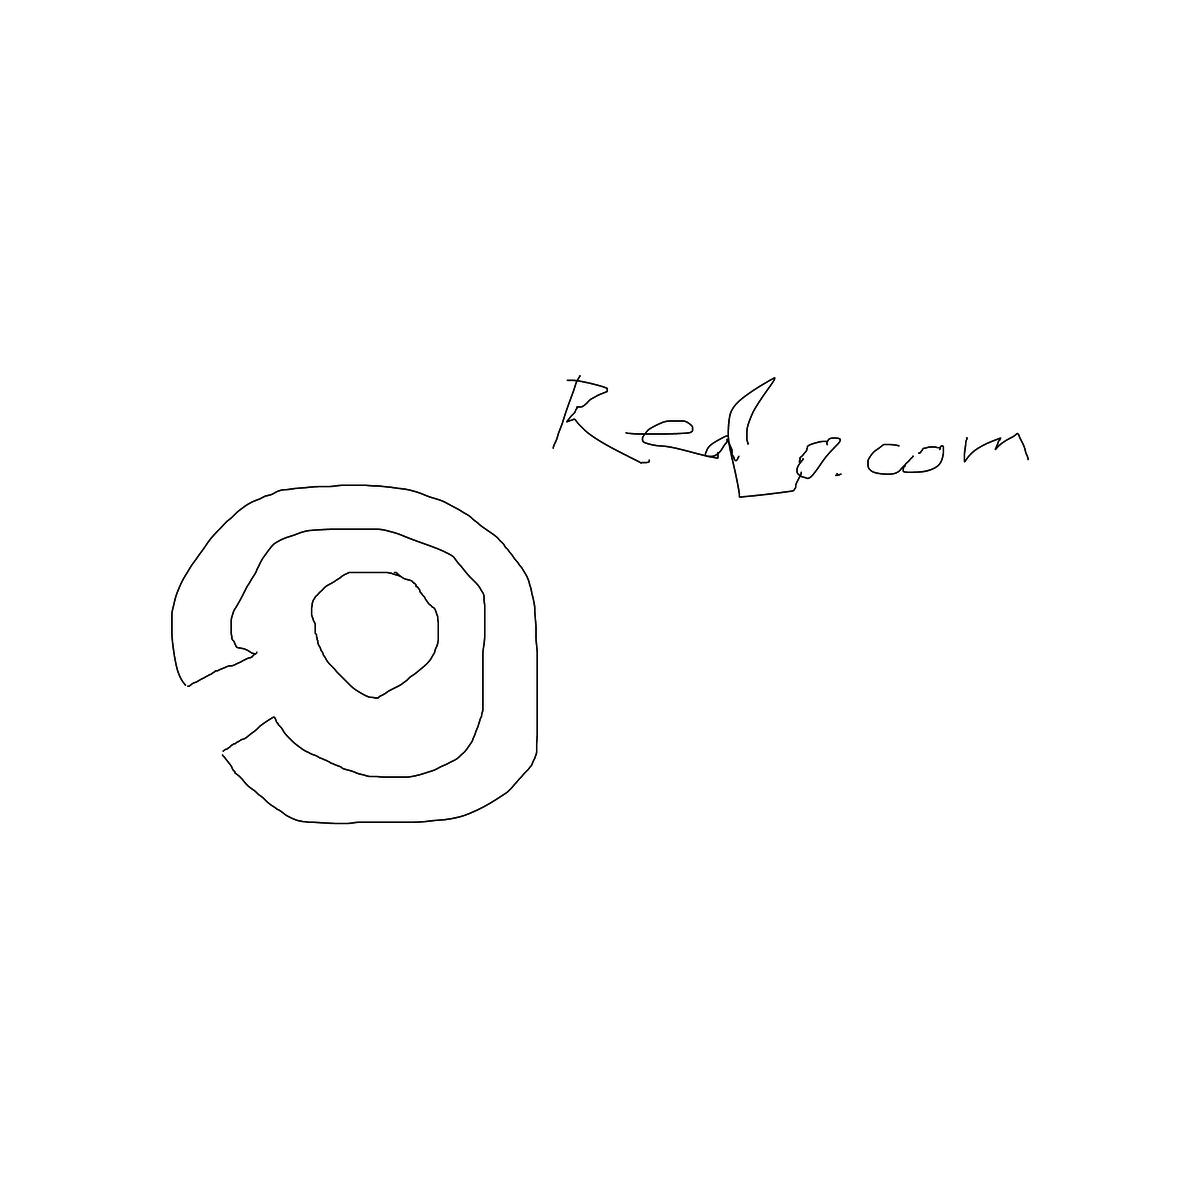 BAAAM drawing#7822 lat:51.0506019592285160lng: 3.7380952835083010